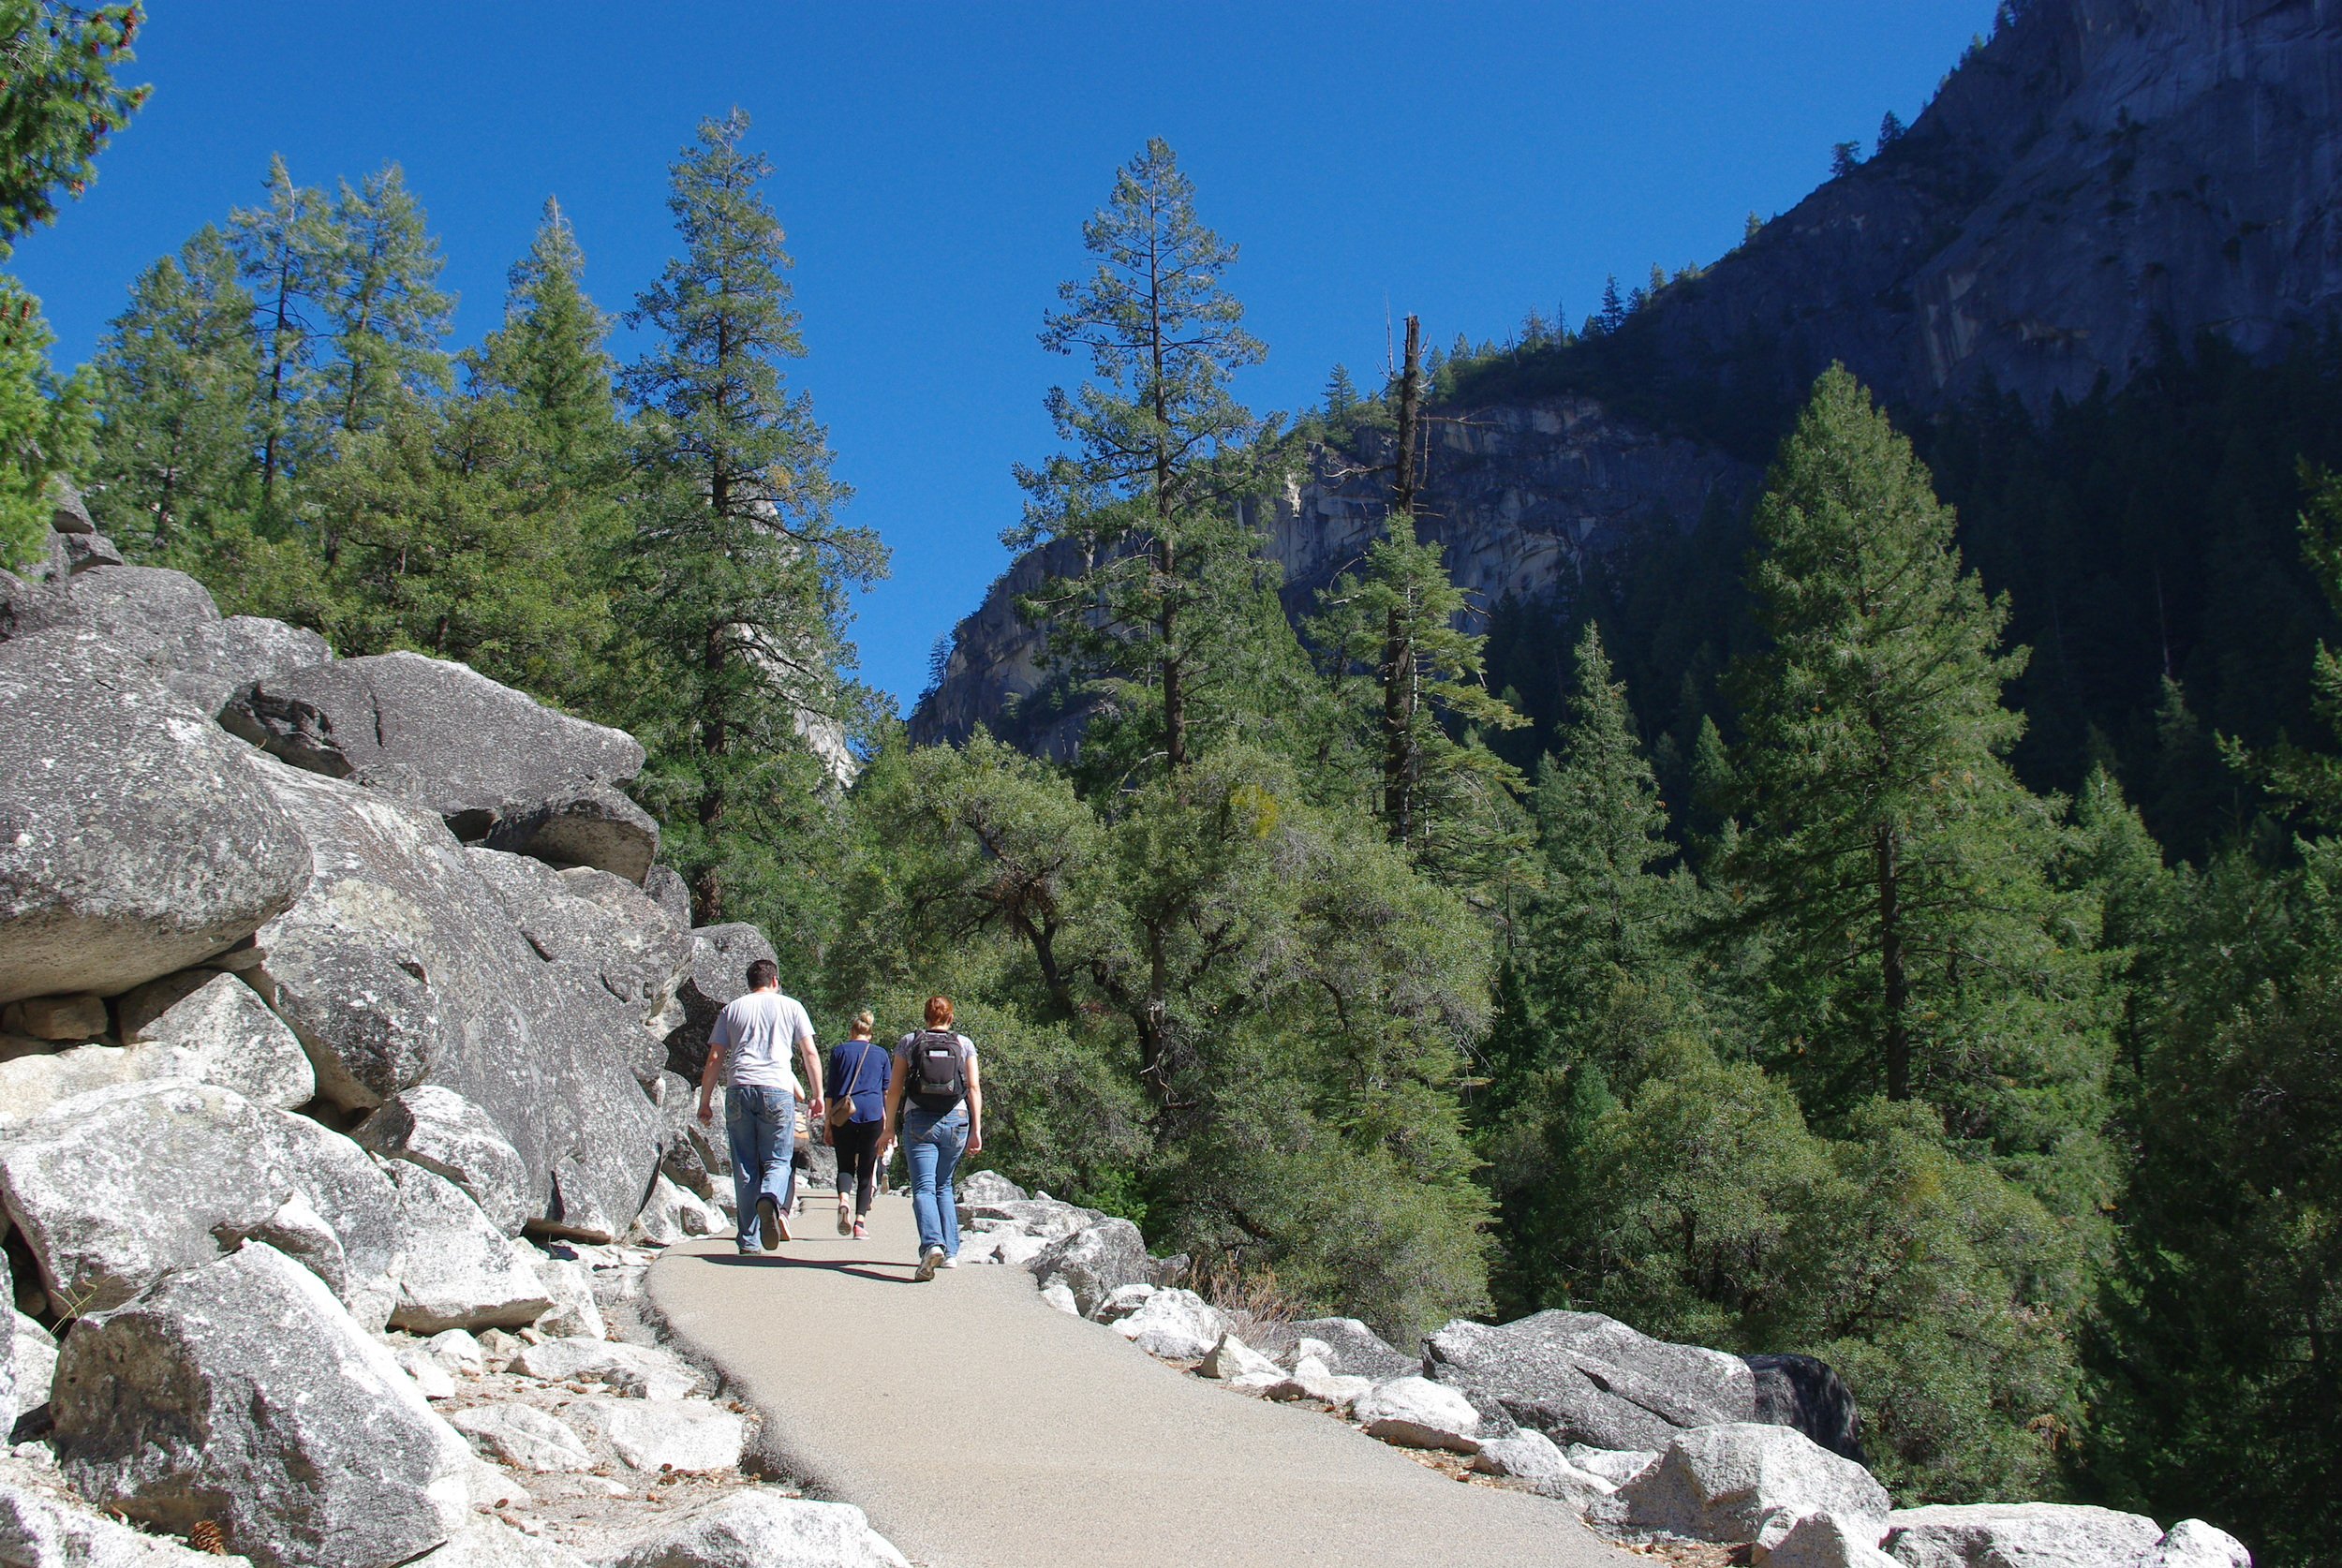 Yosemite National Park Hikers Hiking Jen's Bucket List